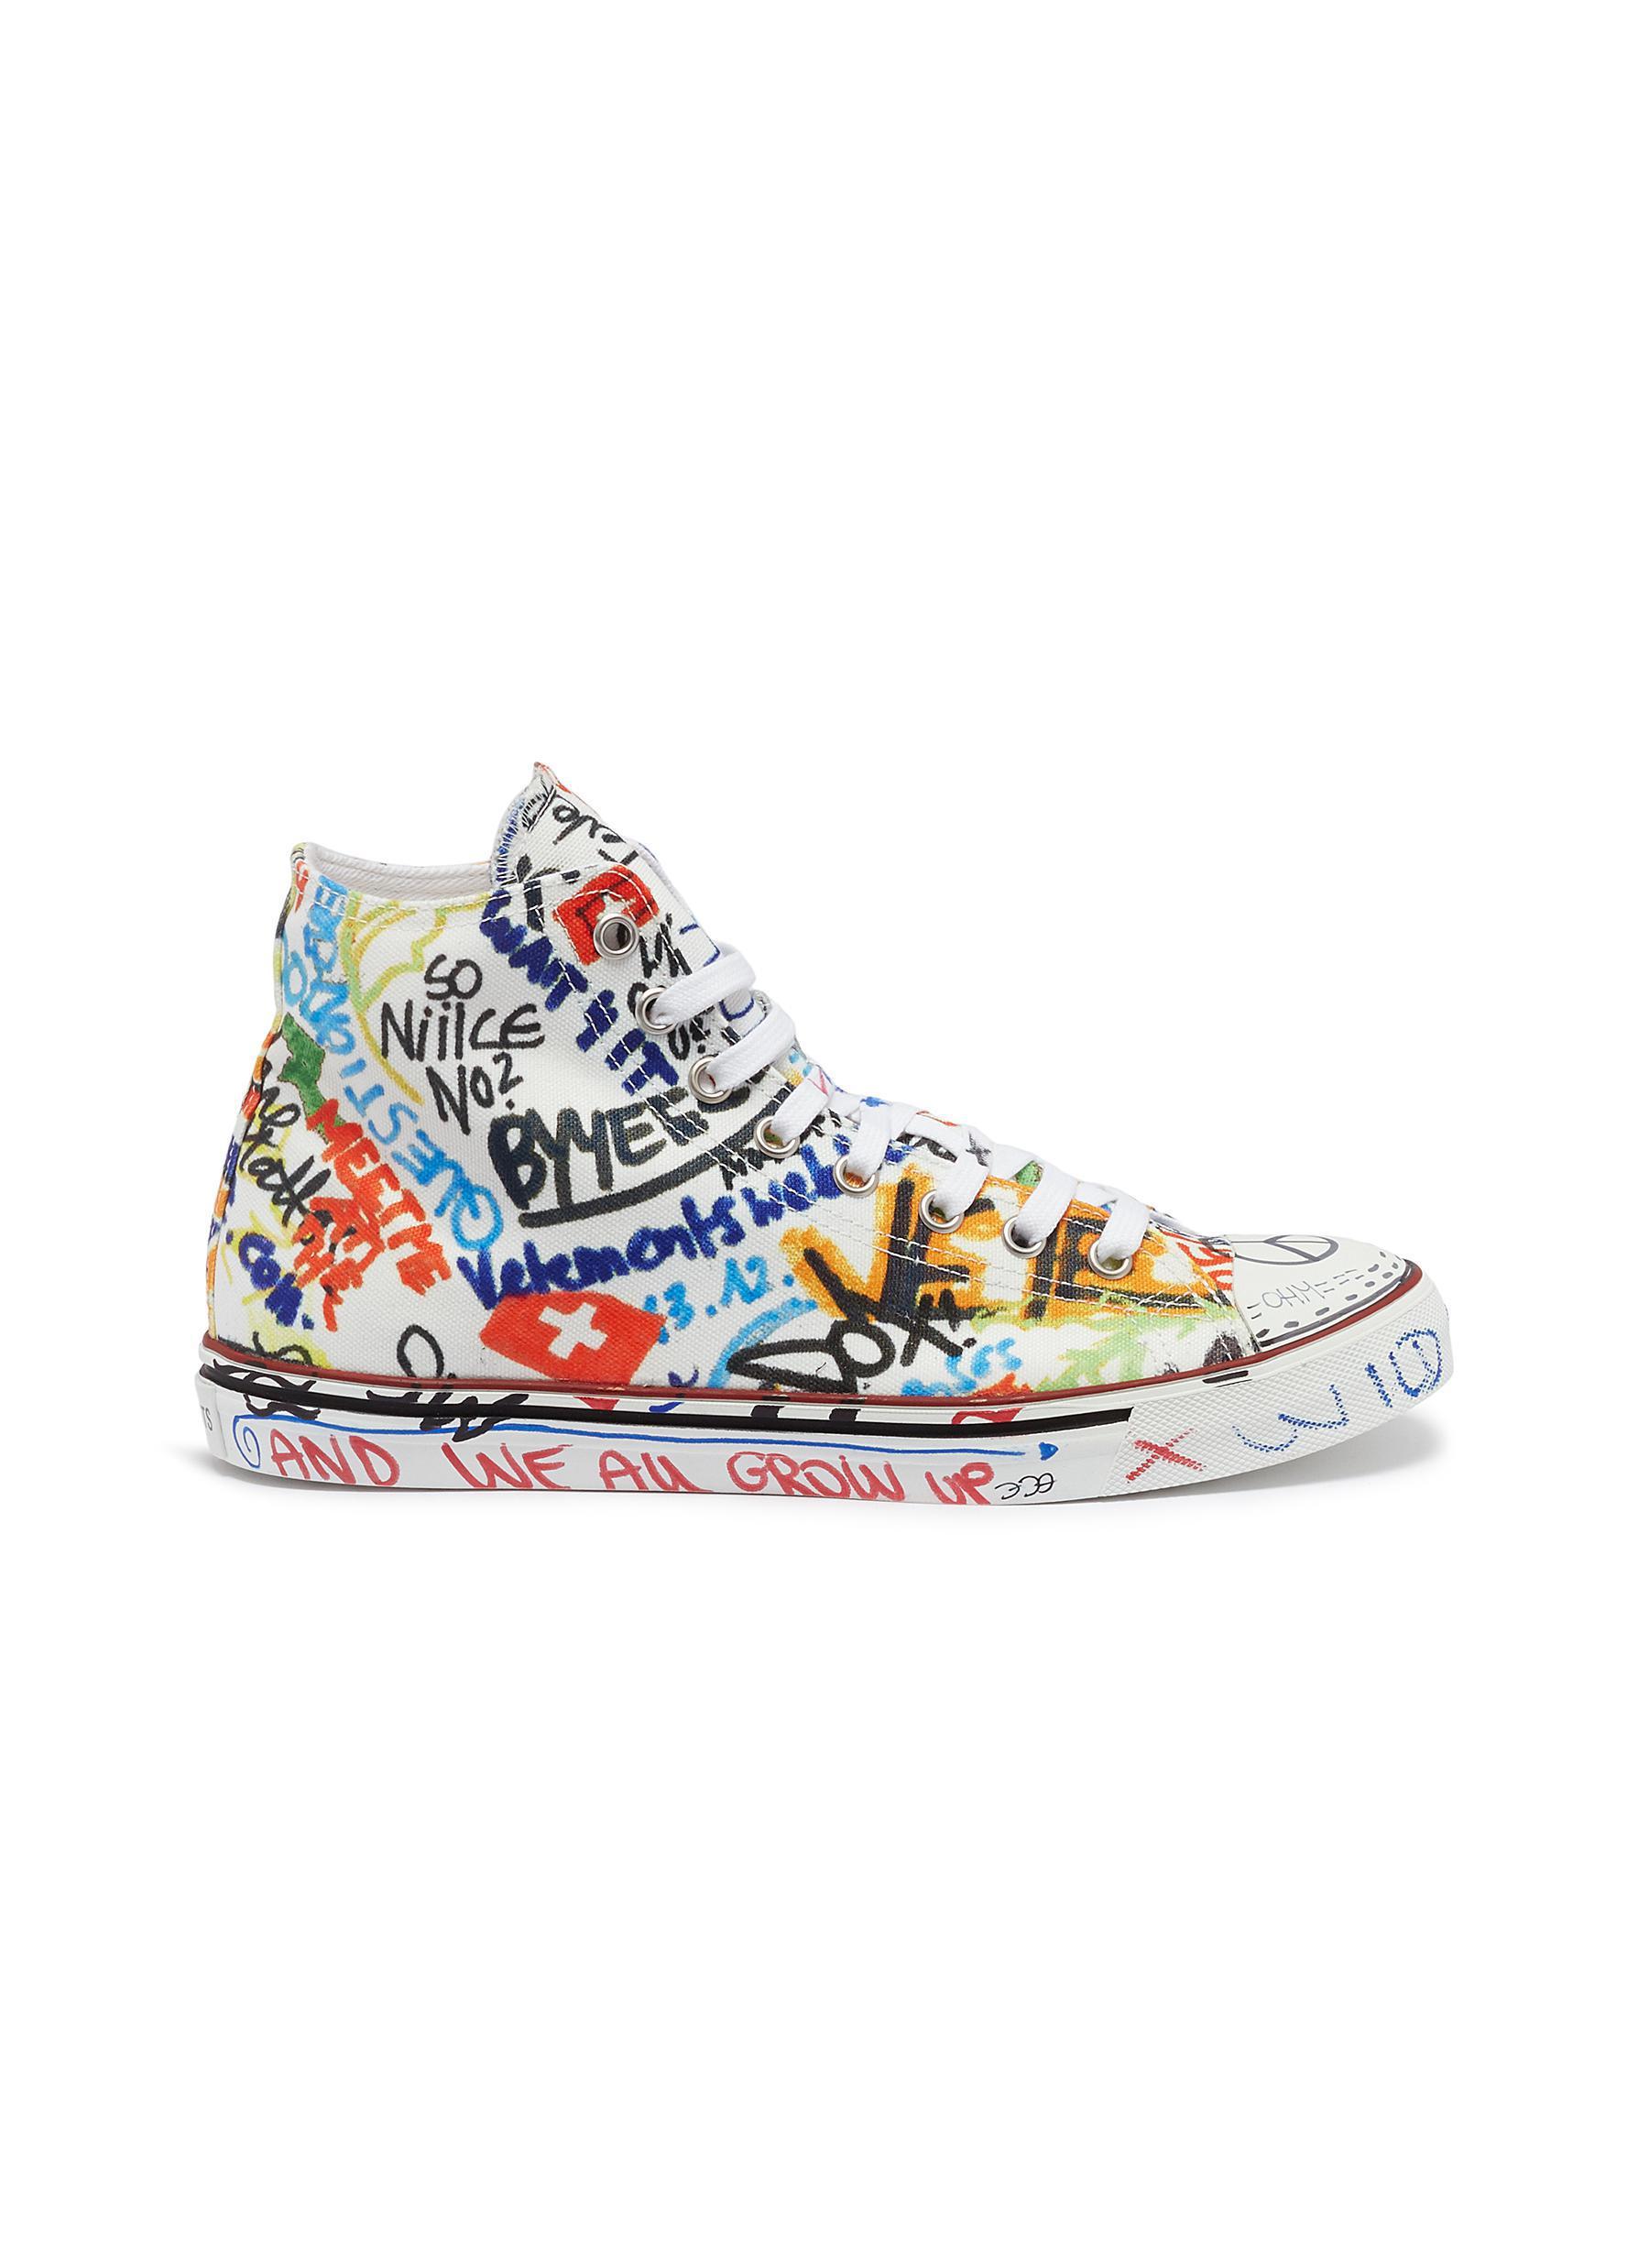 Lyst - Vetements Graffiti Print Canvas High Top Sneakers for Men bcba20f27